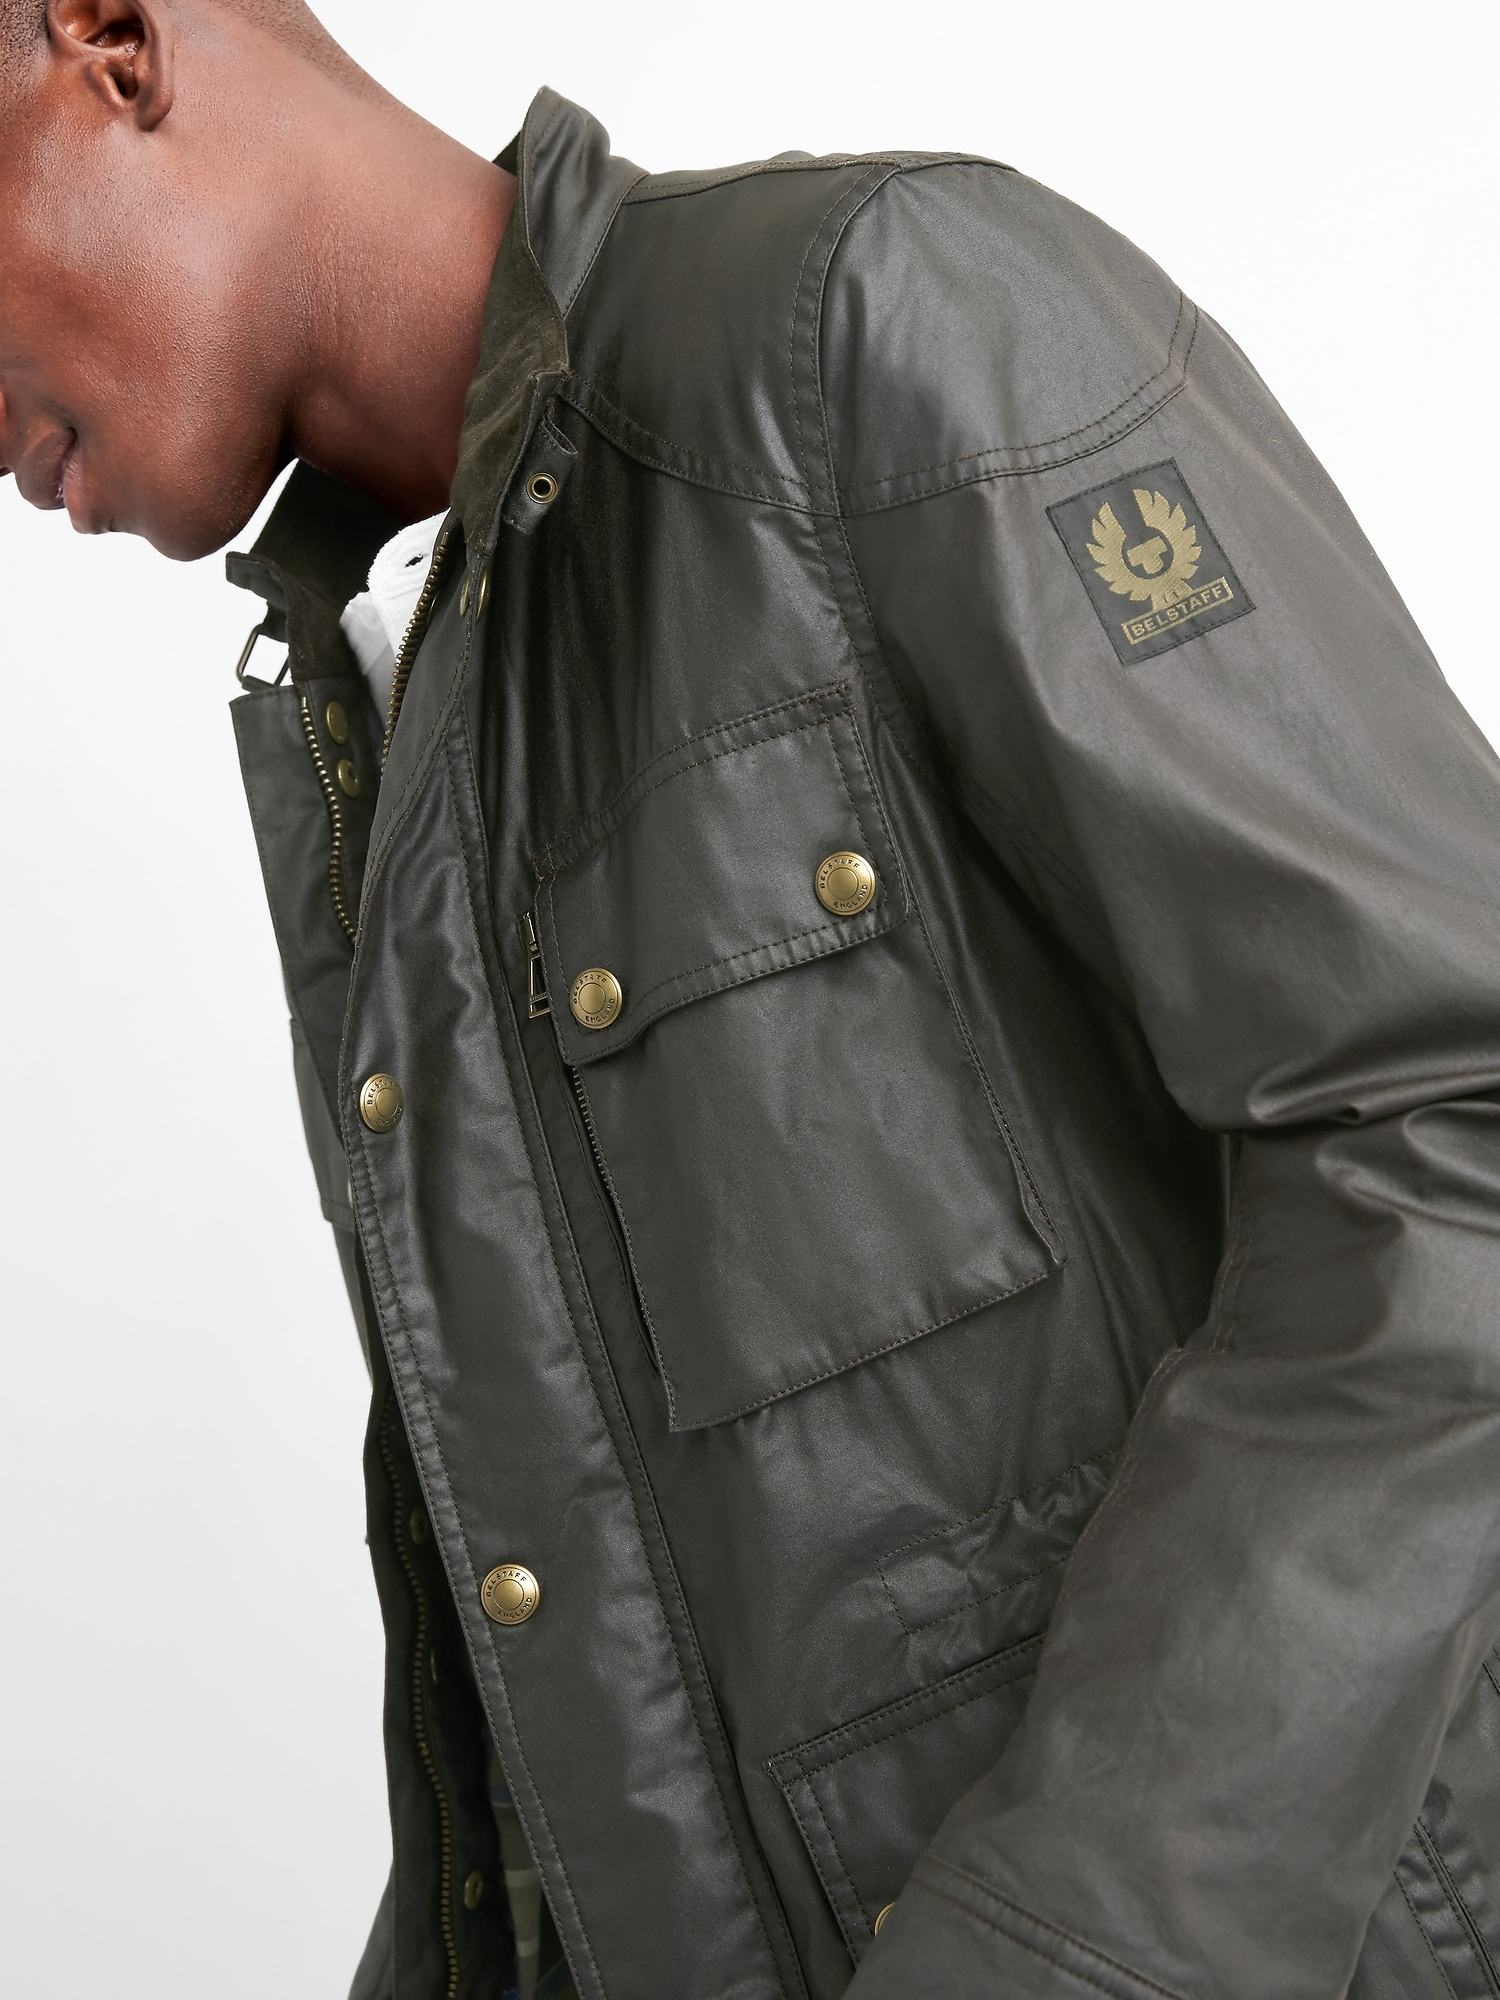 e65238e679 Belstaff™ Trialmaster jacket | Gap